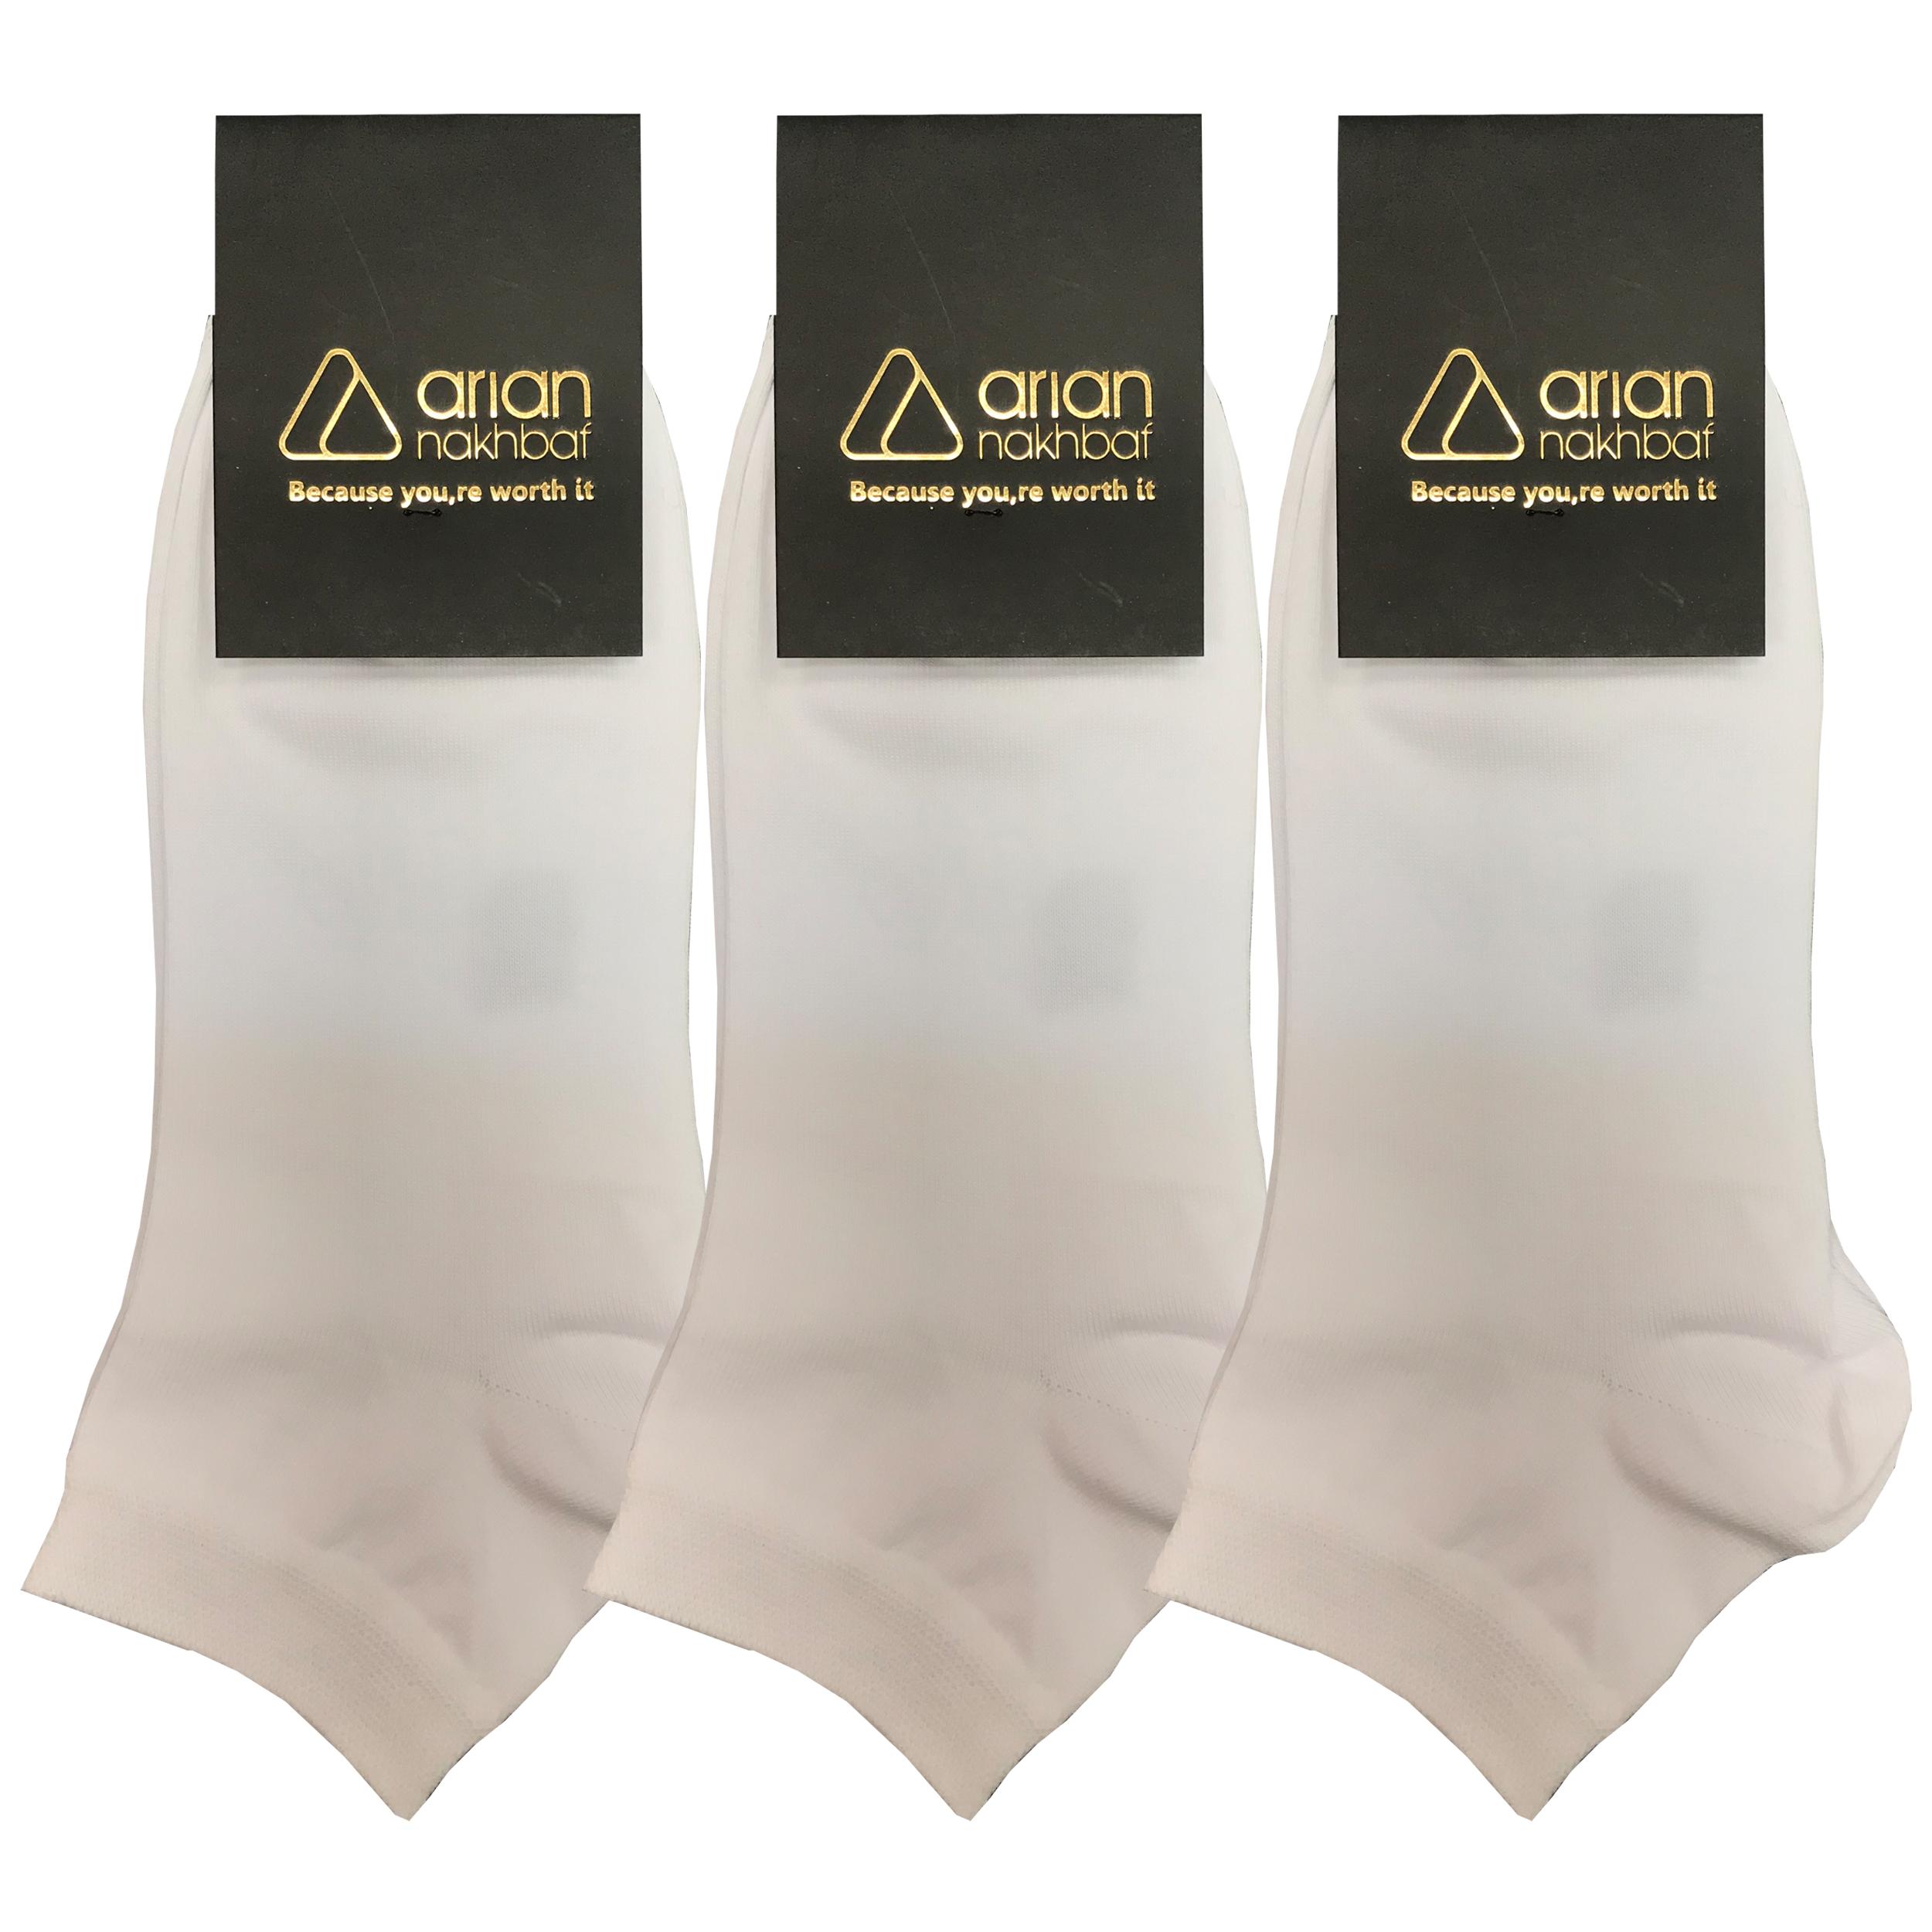 جوراب مردانه آریان نخ باف کد 62211 بسته 3 عددی